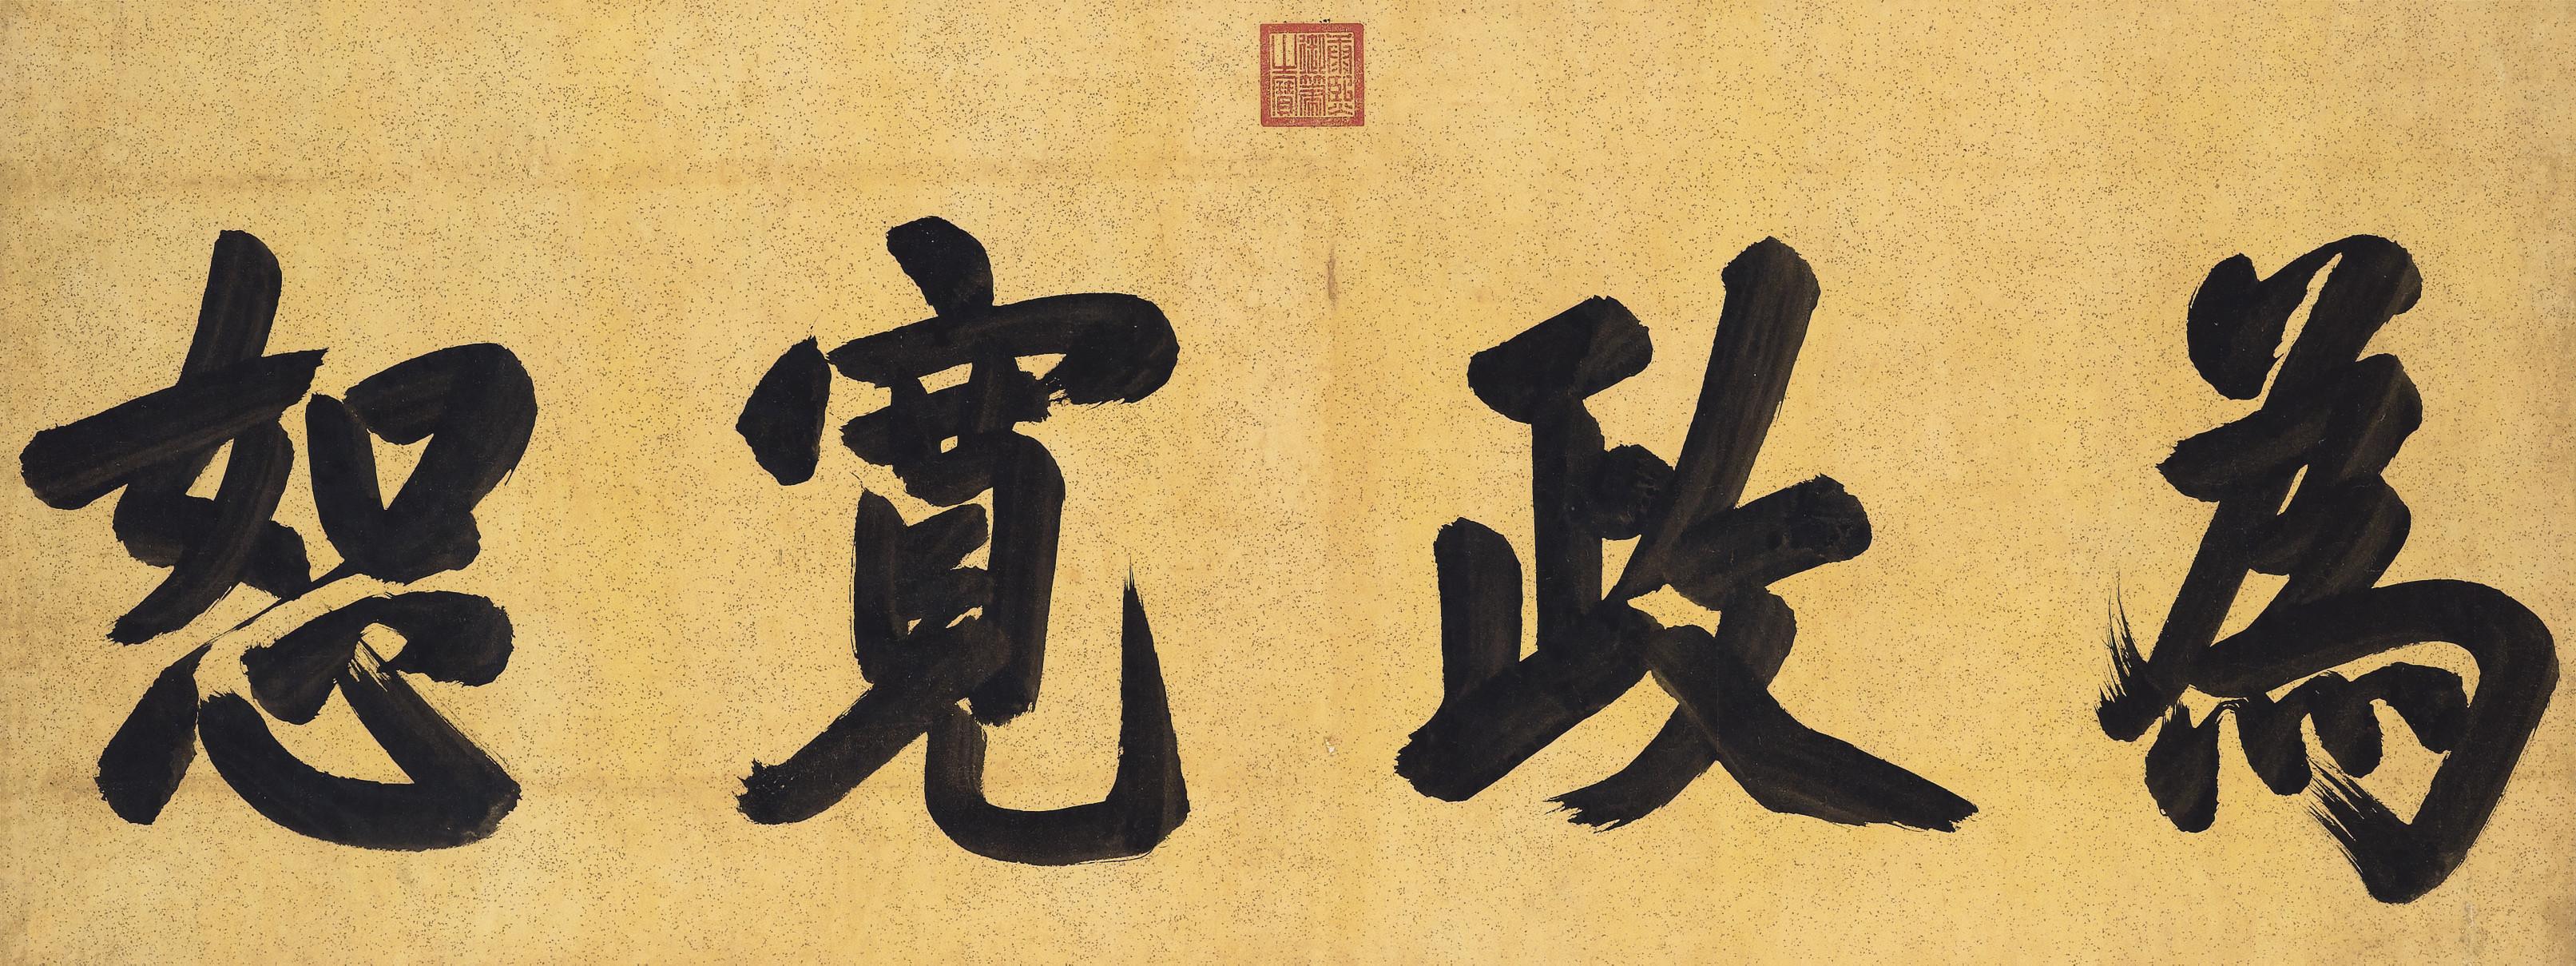 EMPEROR KANGXI (REIGNED 1662-1722)